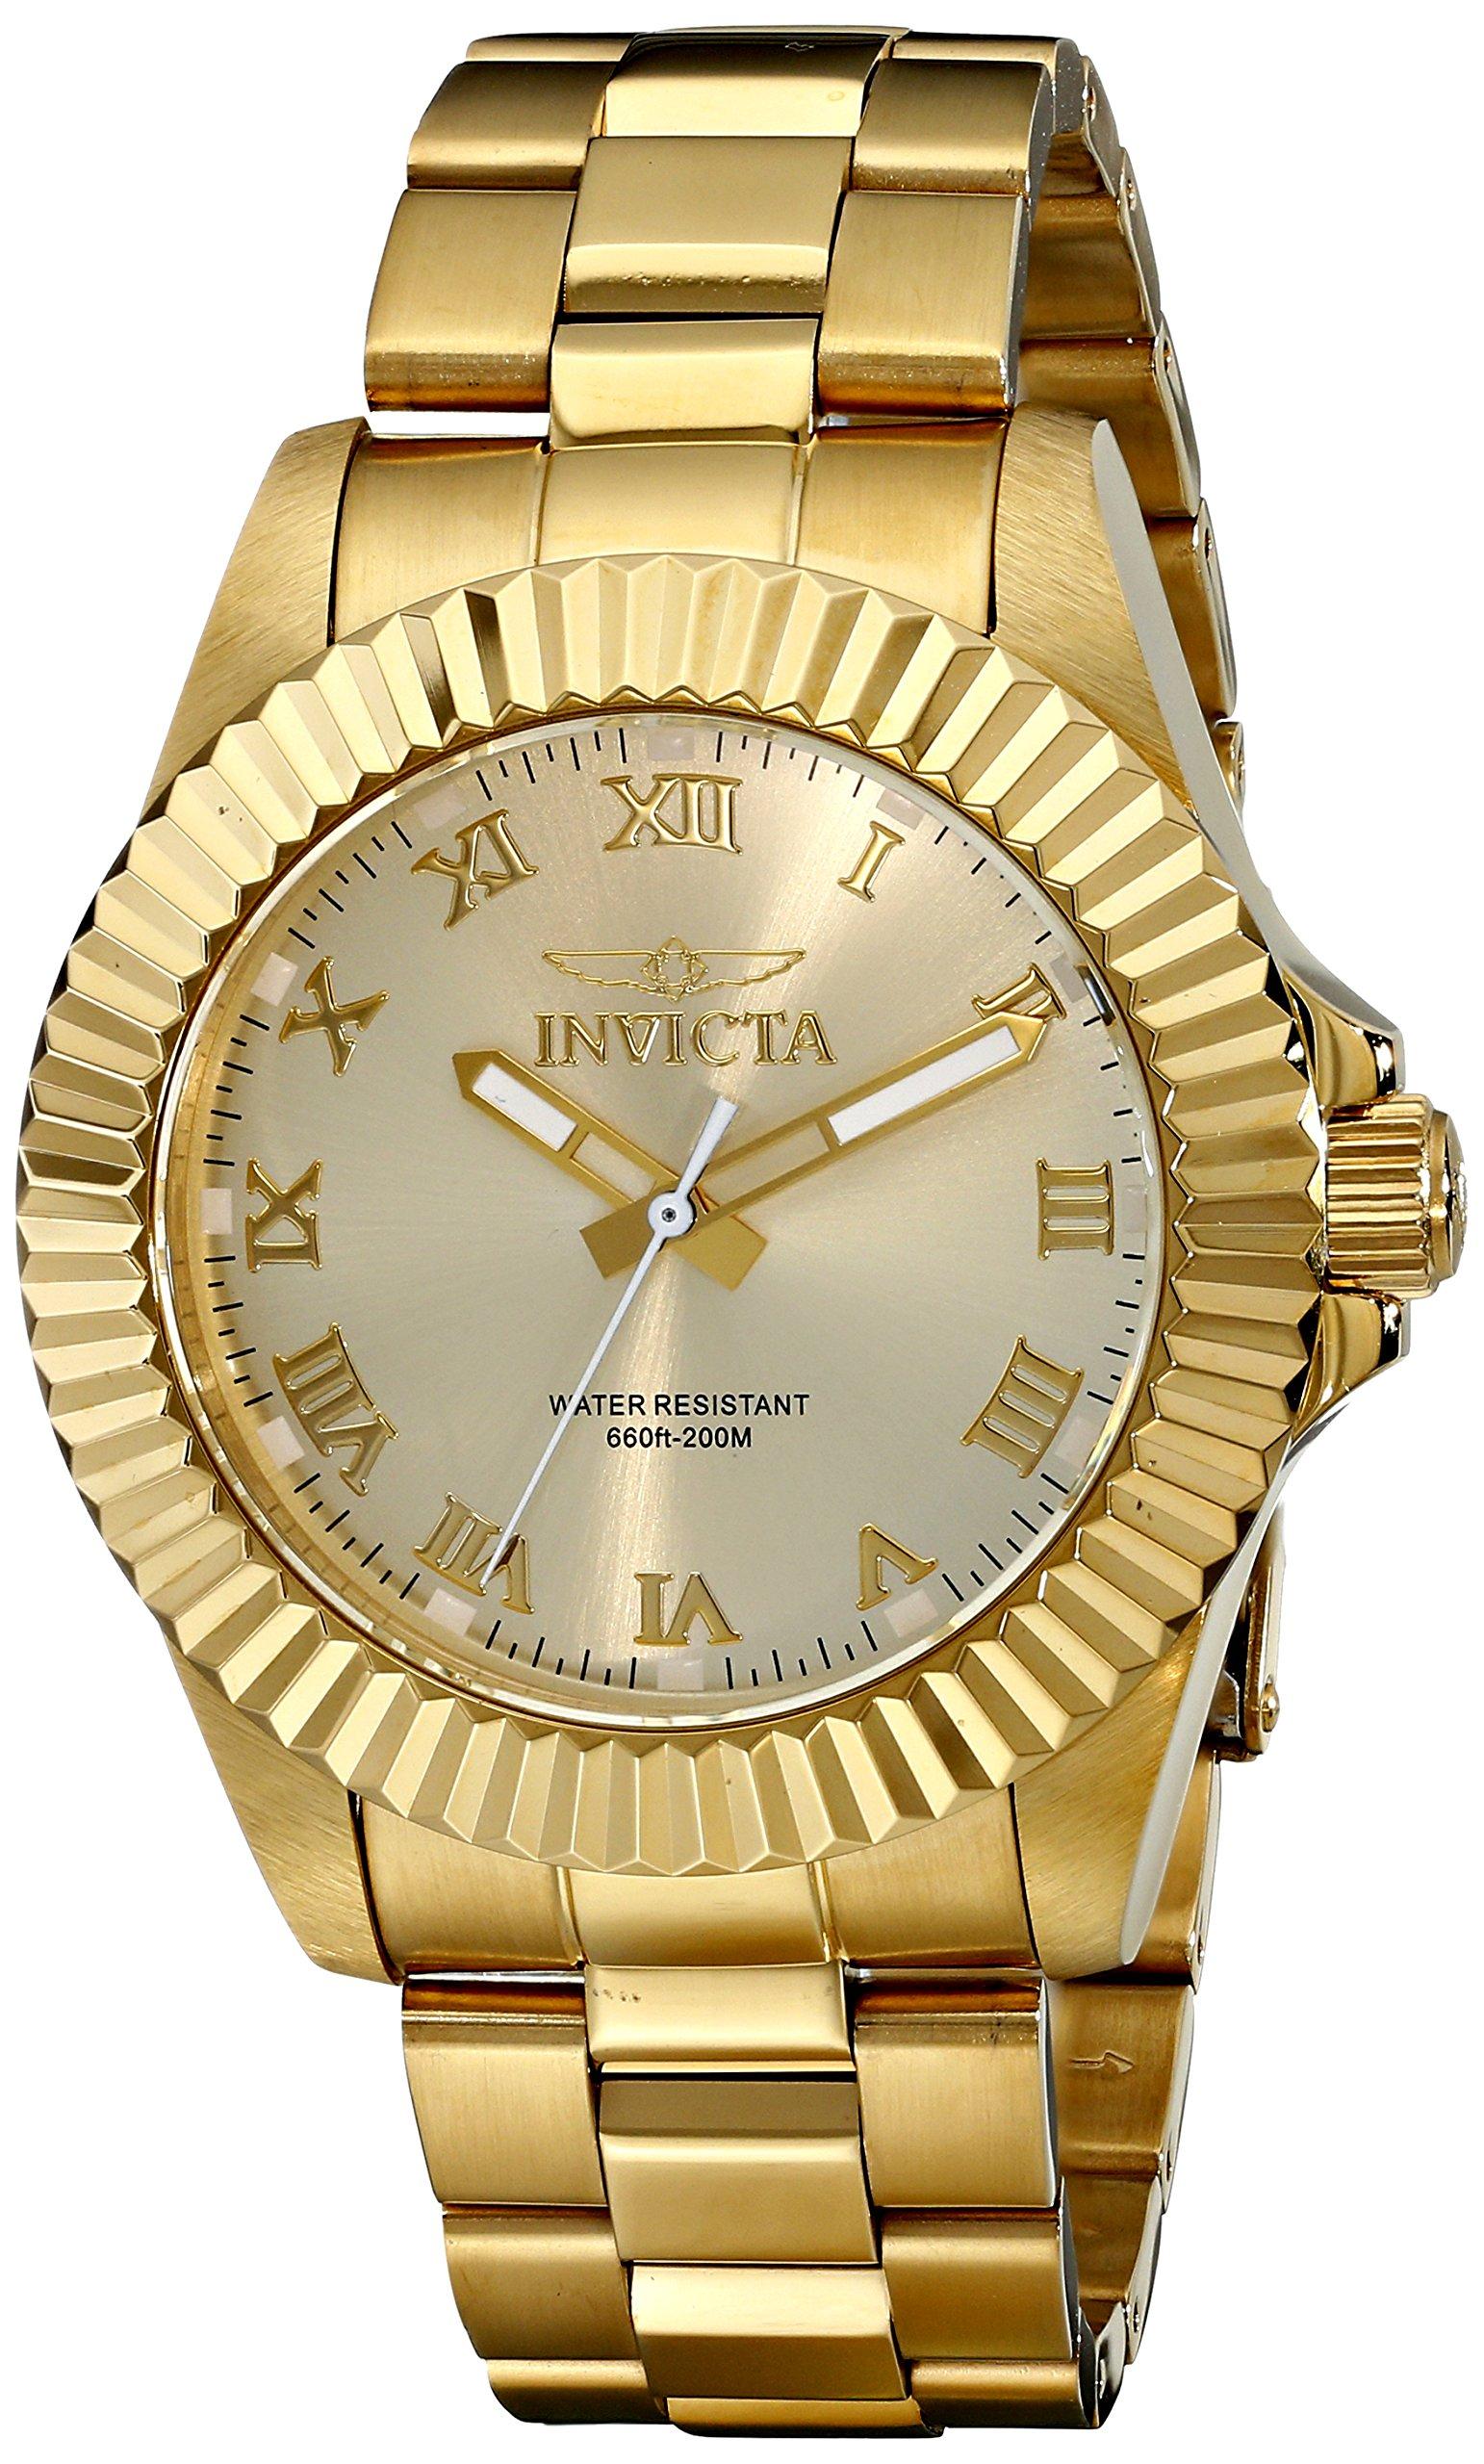 Invicta Men's 16739 Pro Diver Analog Display Swiss Quartz Gold Watch by Invicta